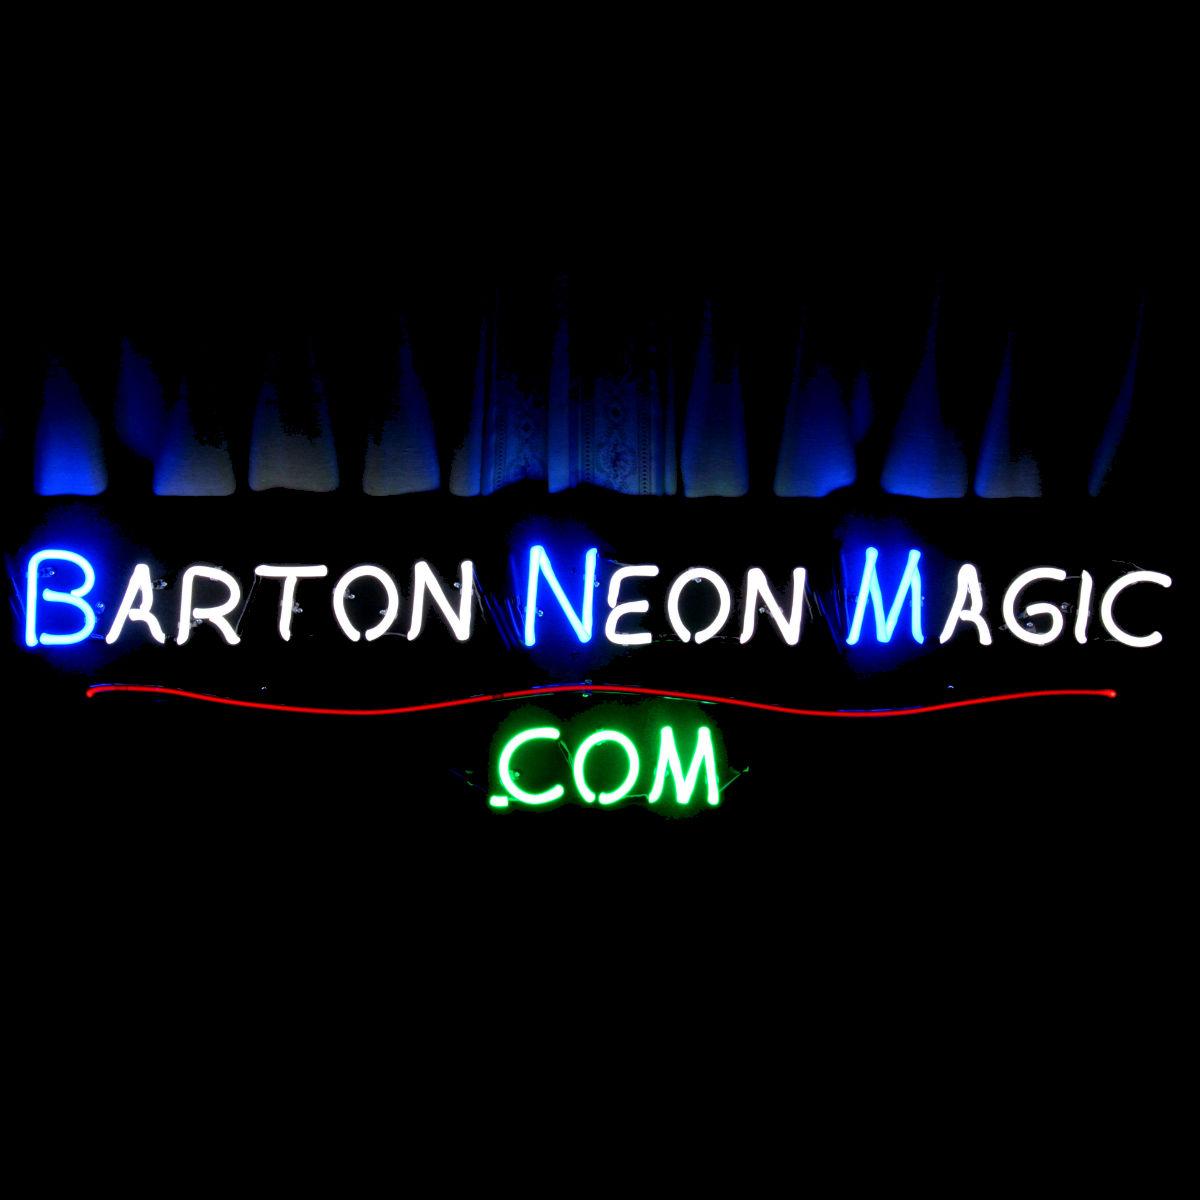 BartonNeonMagic.com - Fine Designer Neon Light Sculptures by John Barton - Famous USA Neon Glass Artist